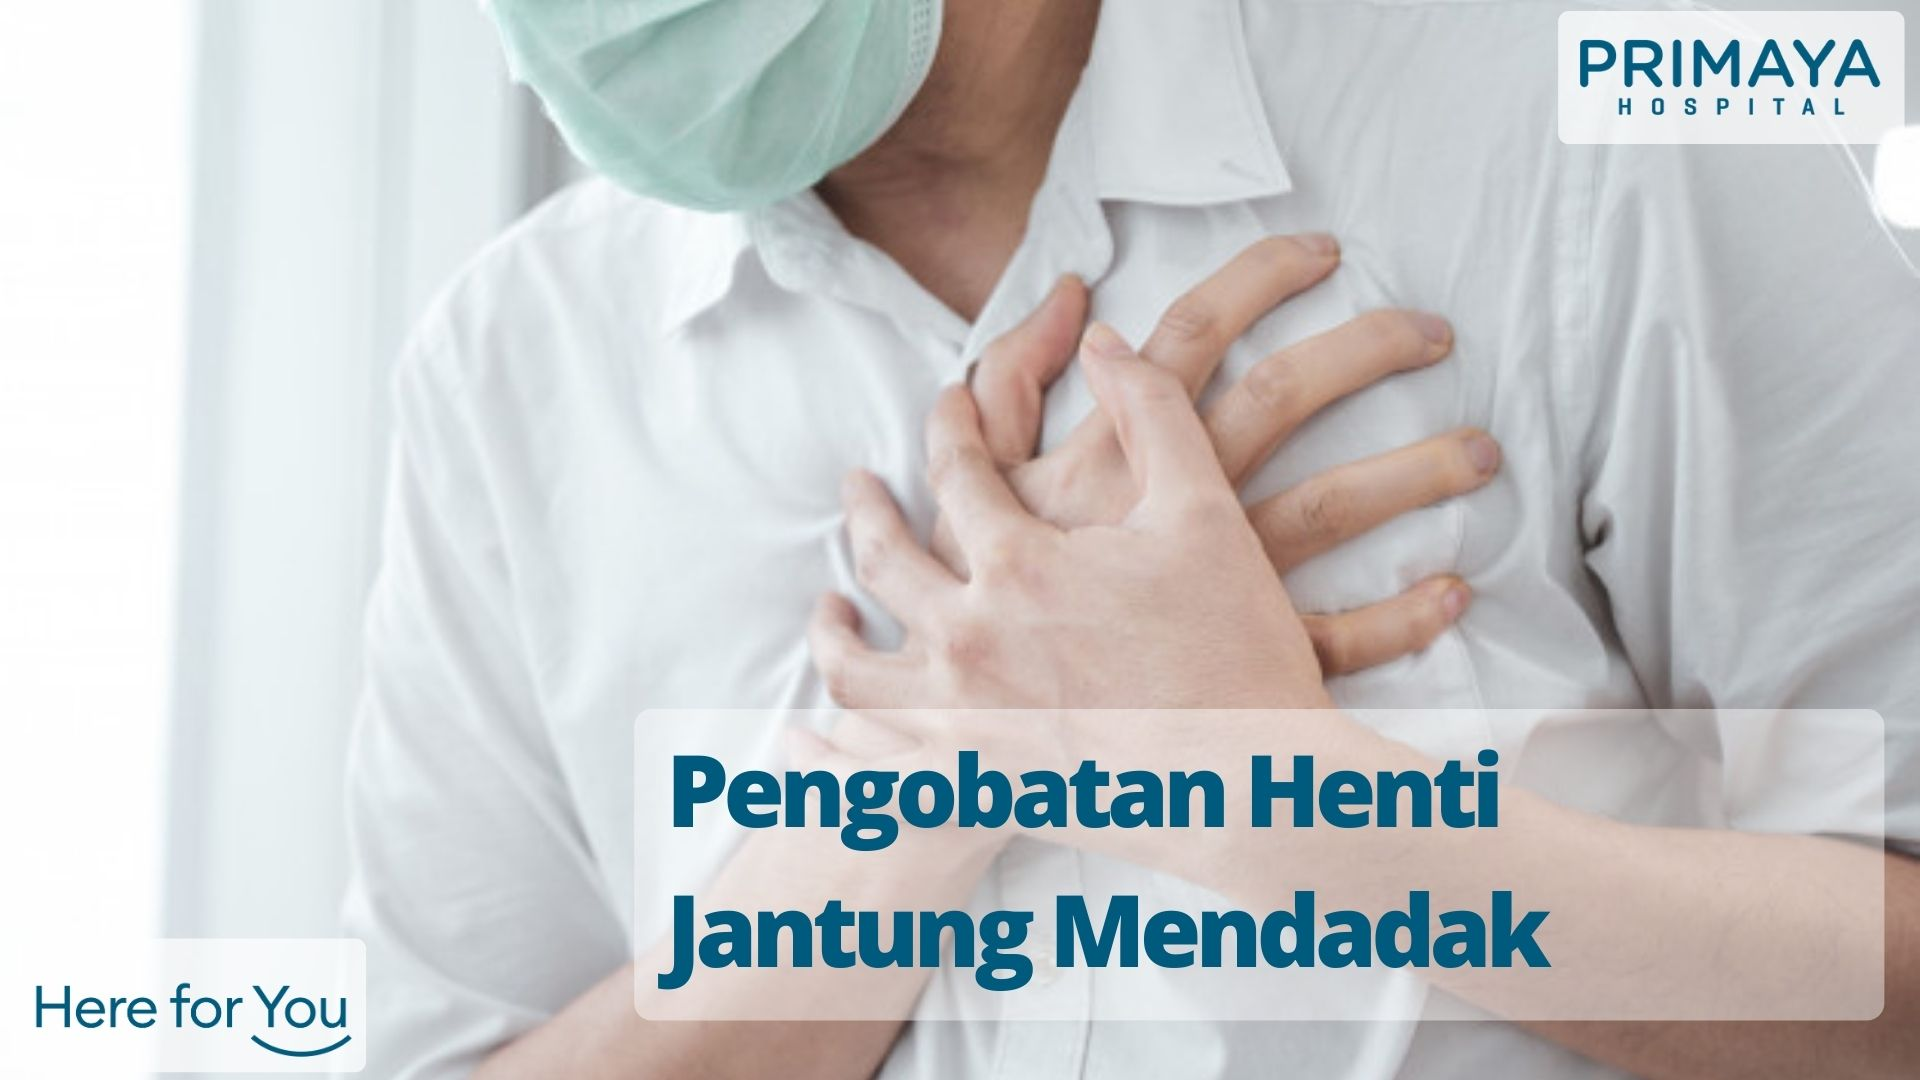 Pengobatan Henti Jantung Mendadak